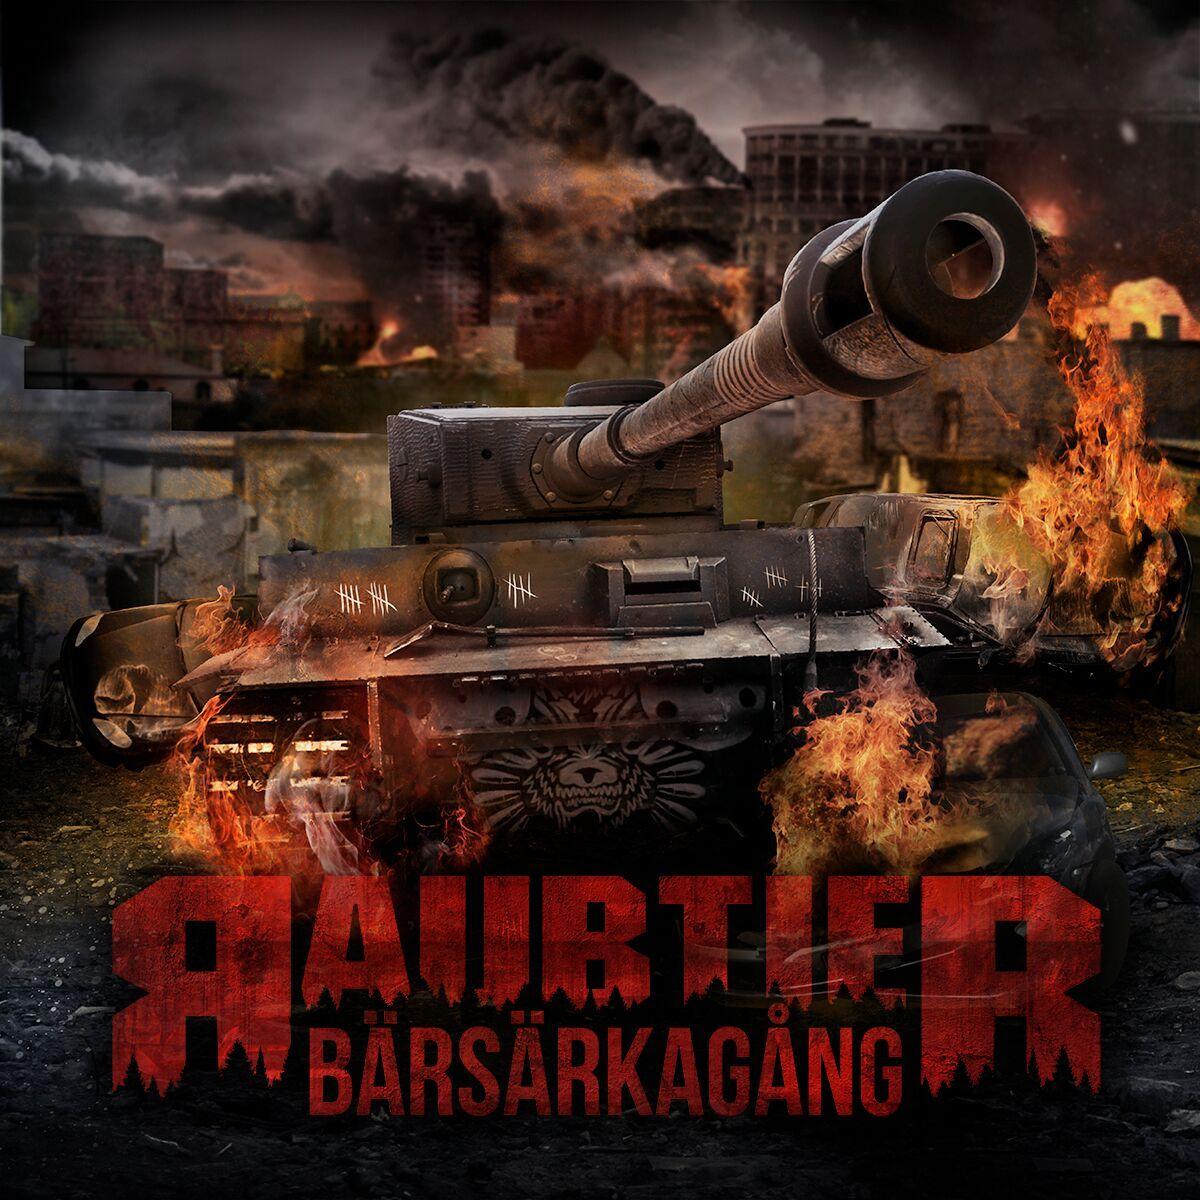 raubtier-barsarkargang-cover